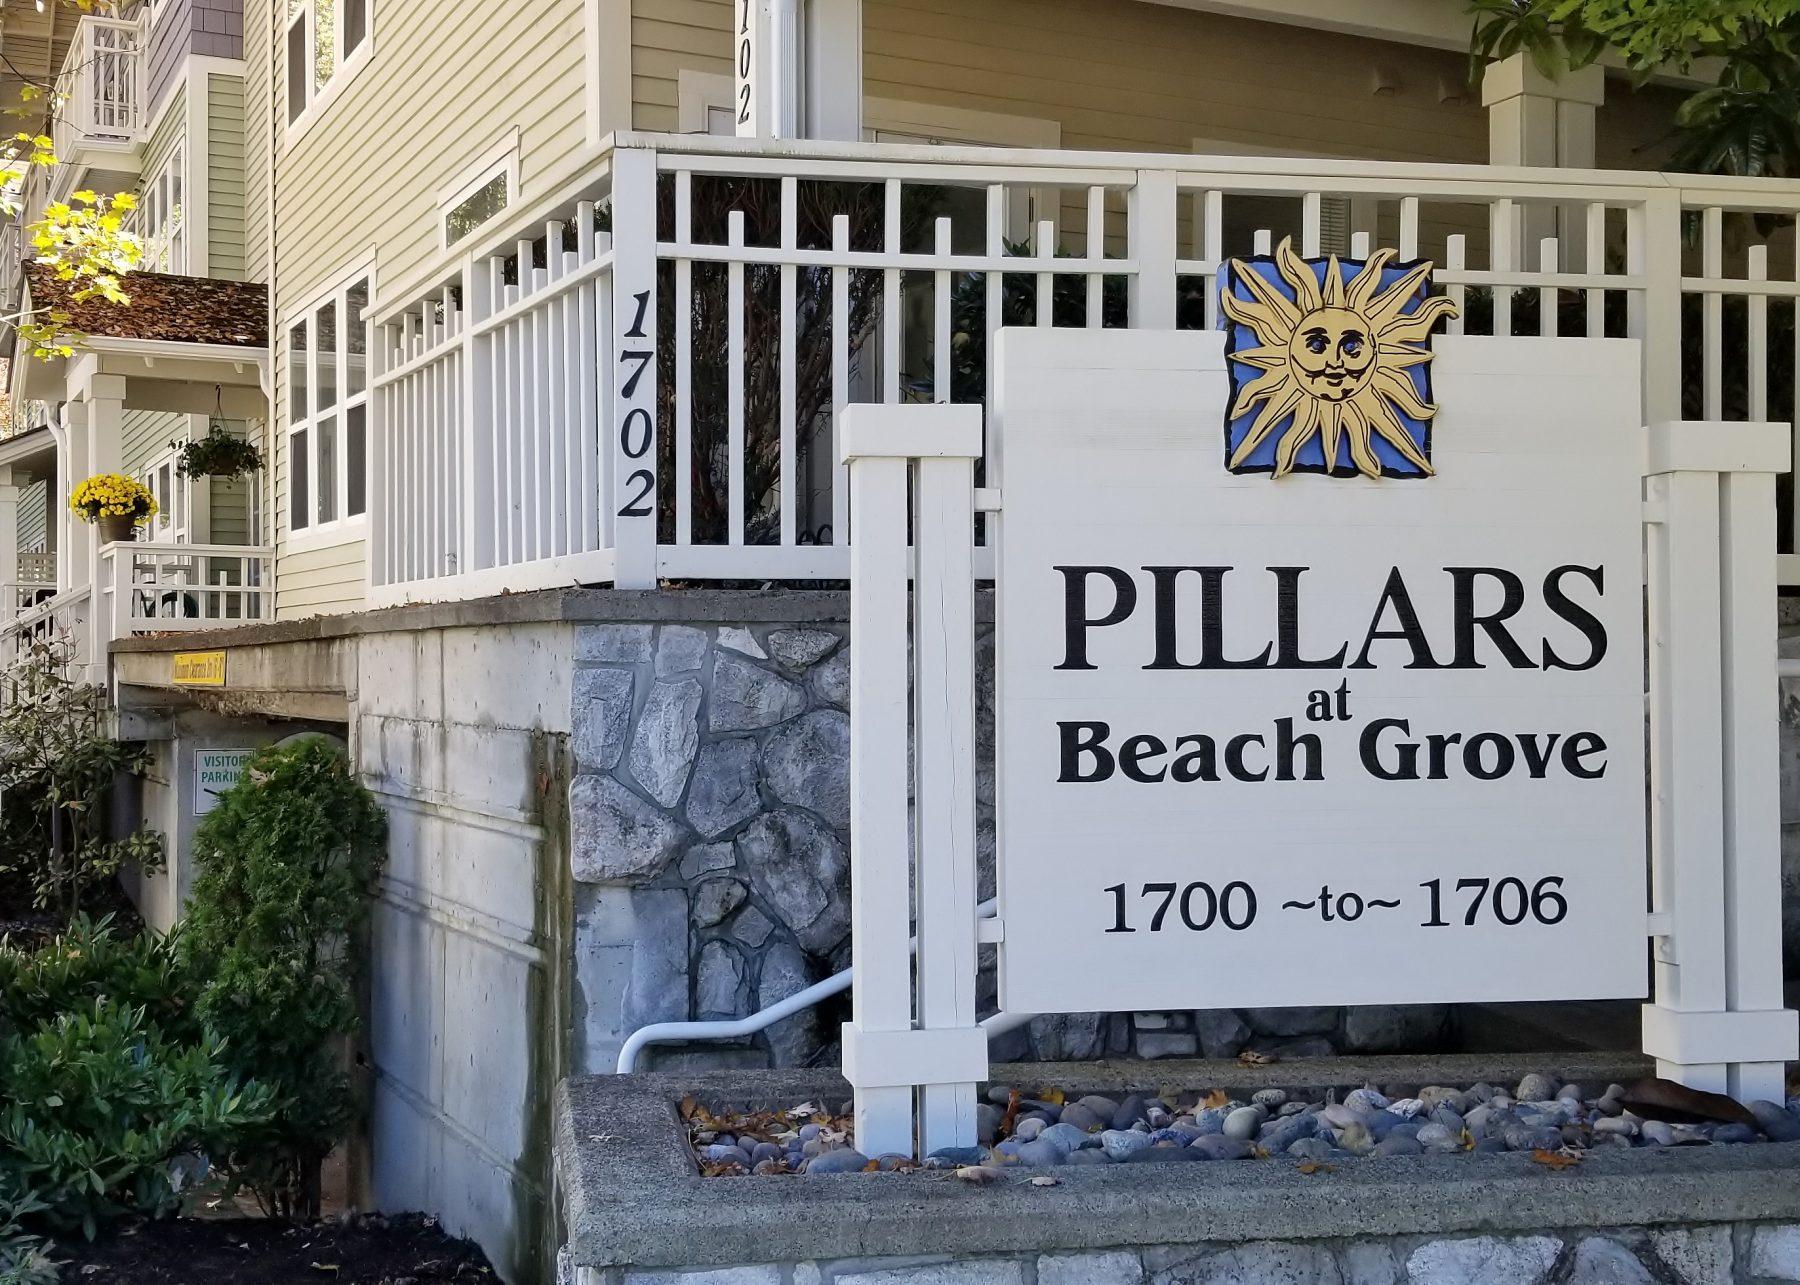 The Pillars 1